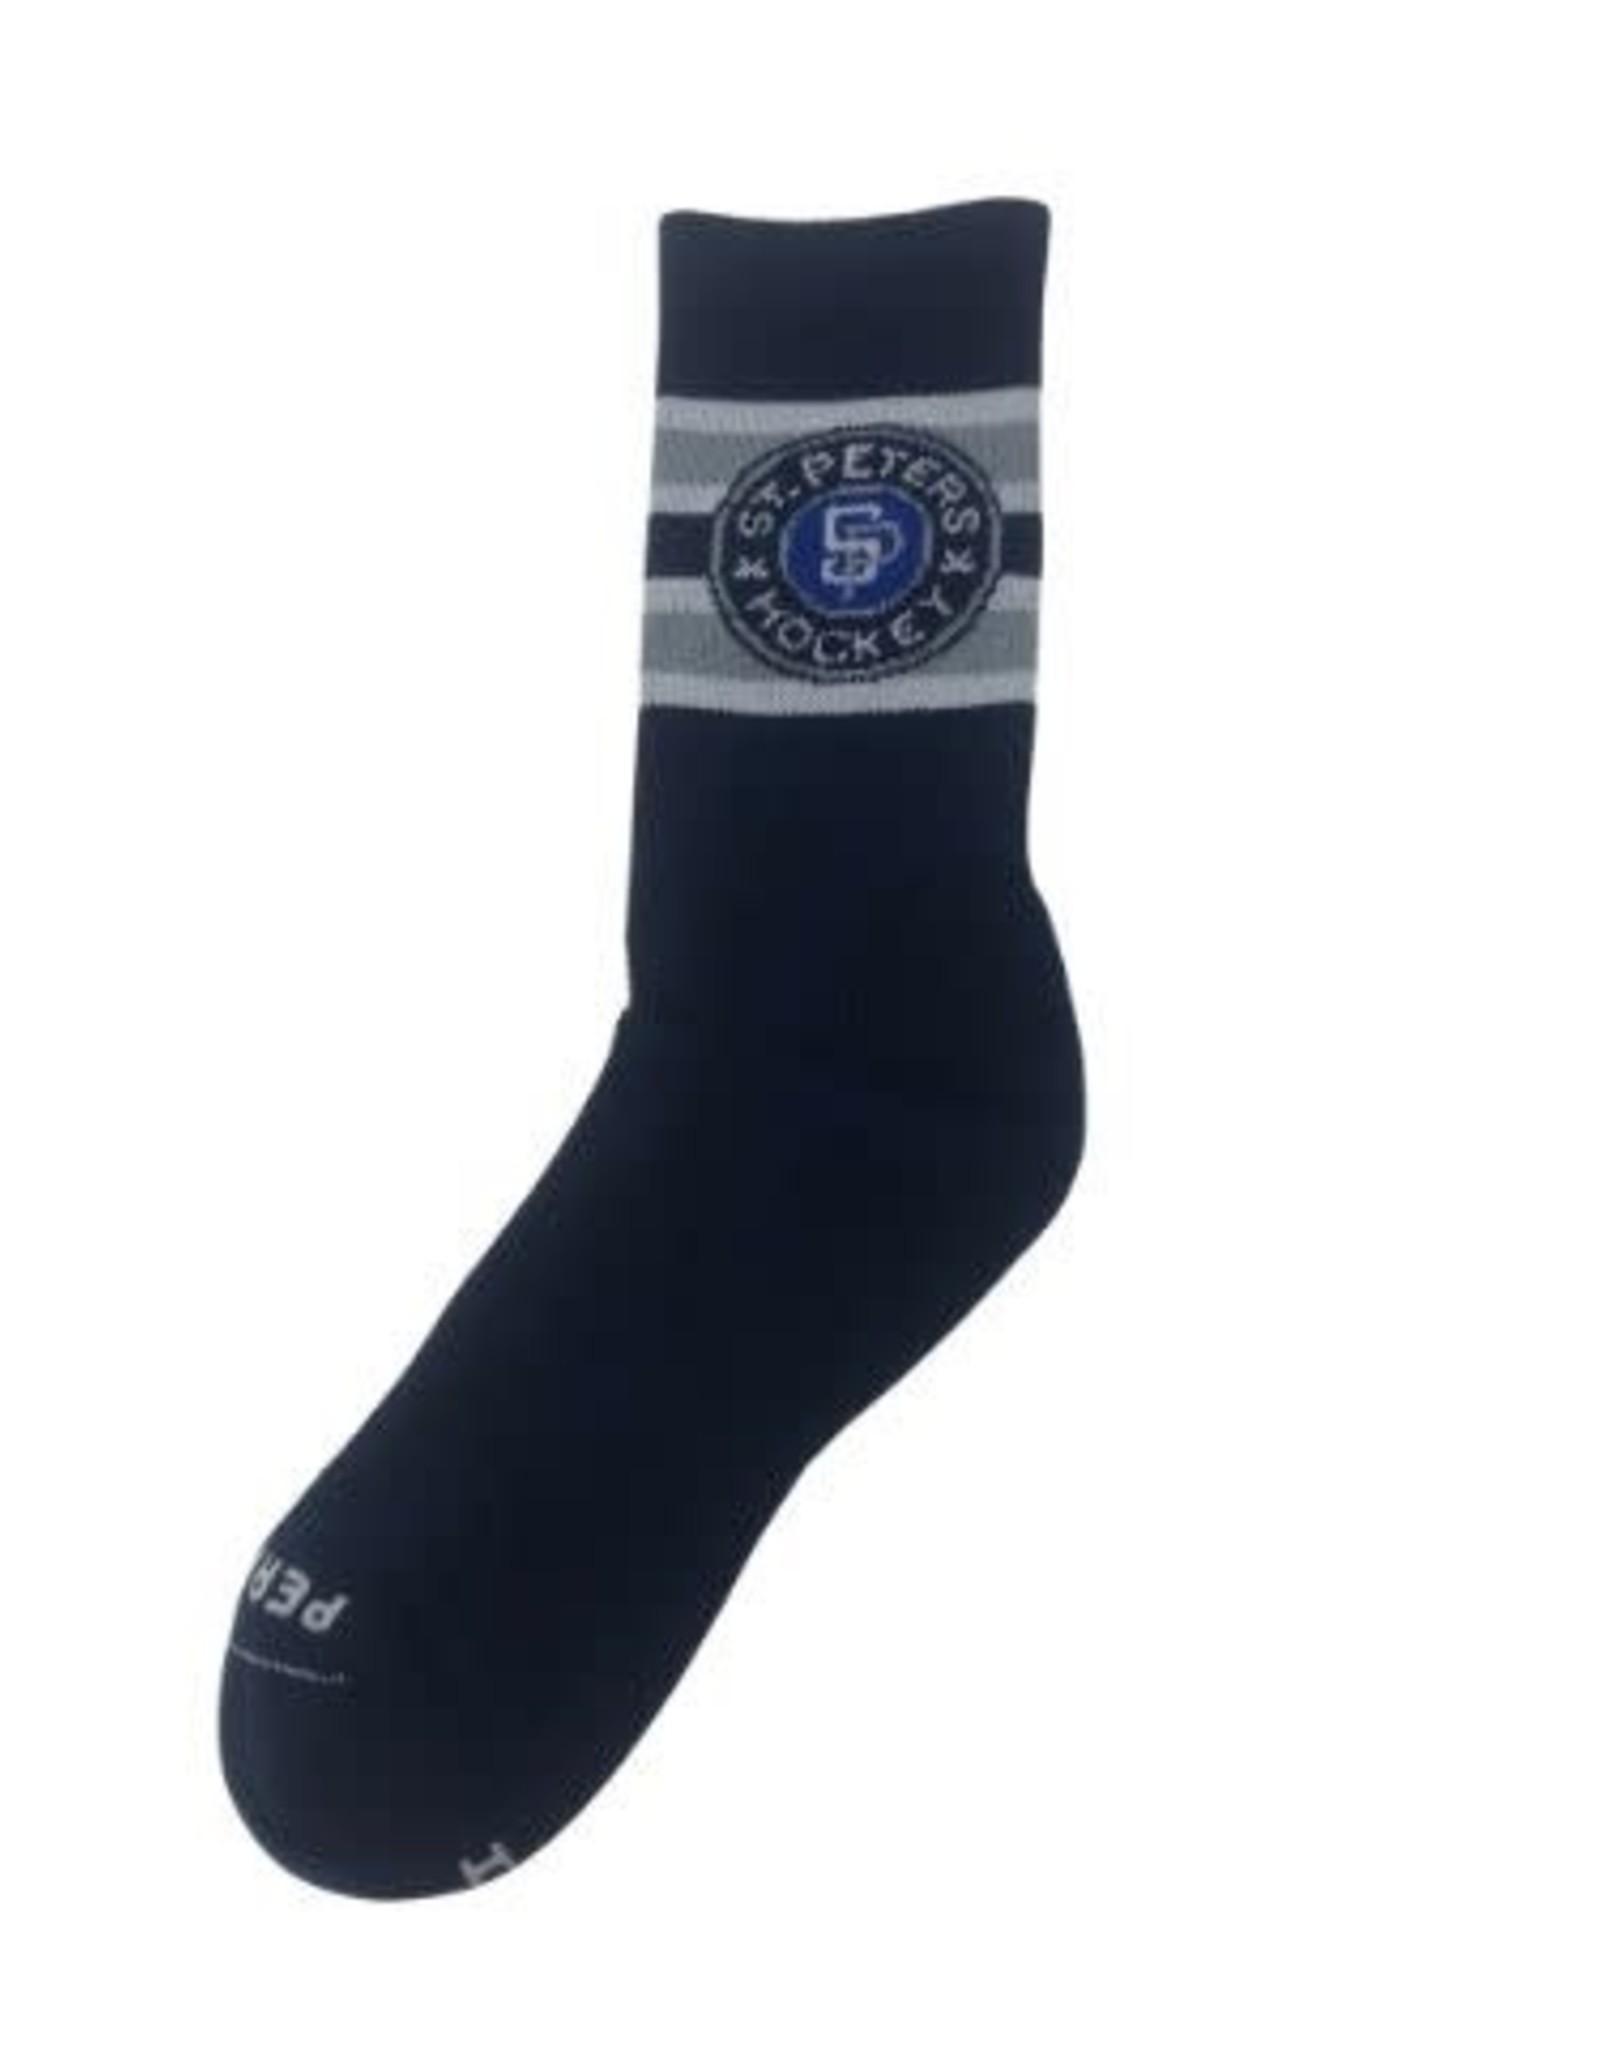 Pear Sox STP Skate Sock (Intermediate) Navy